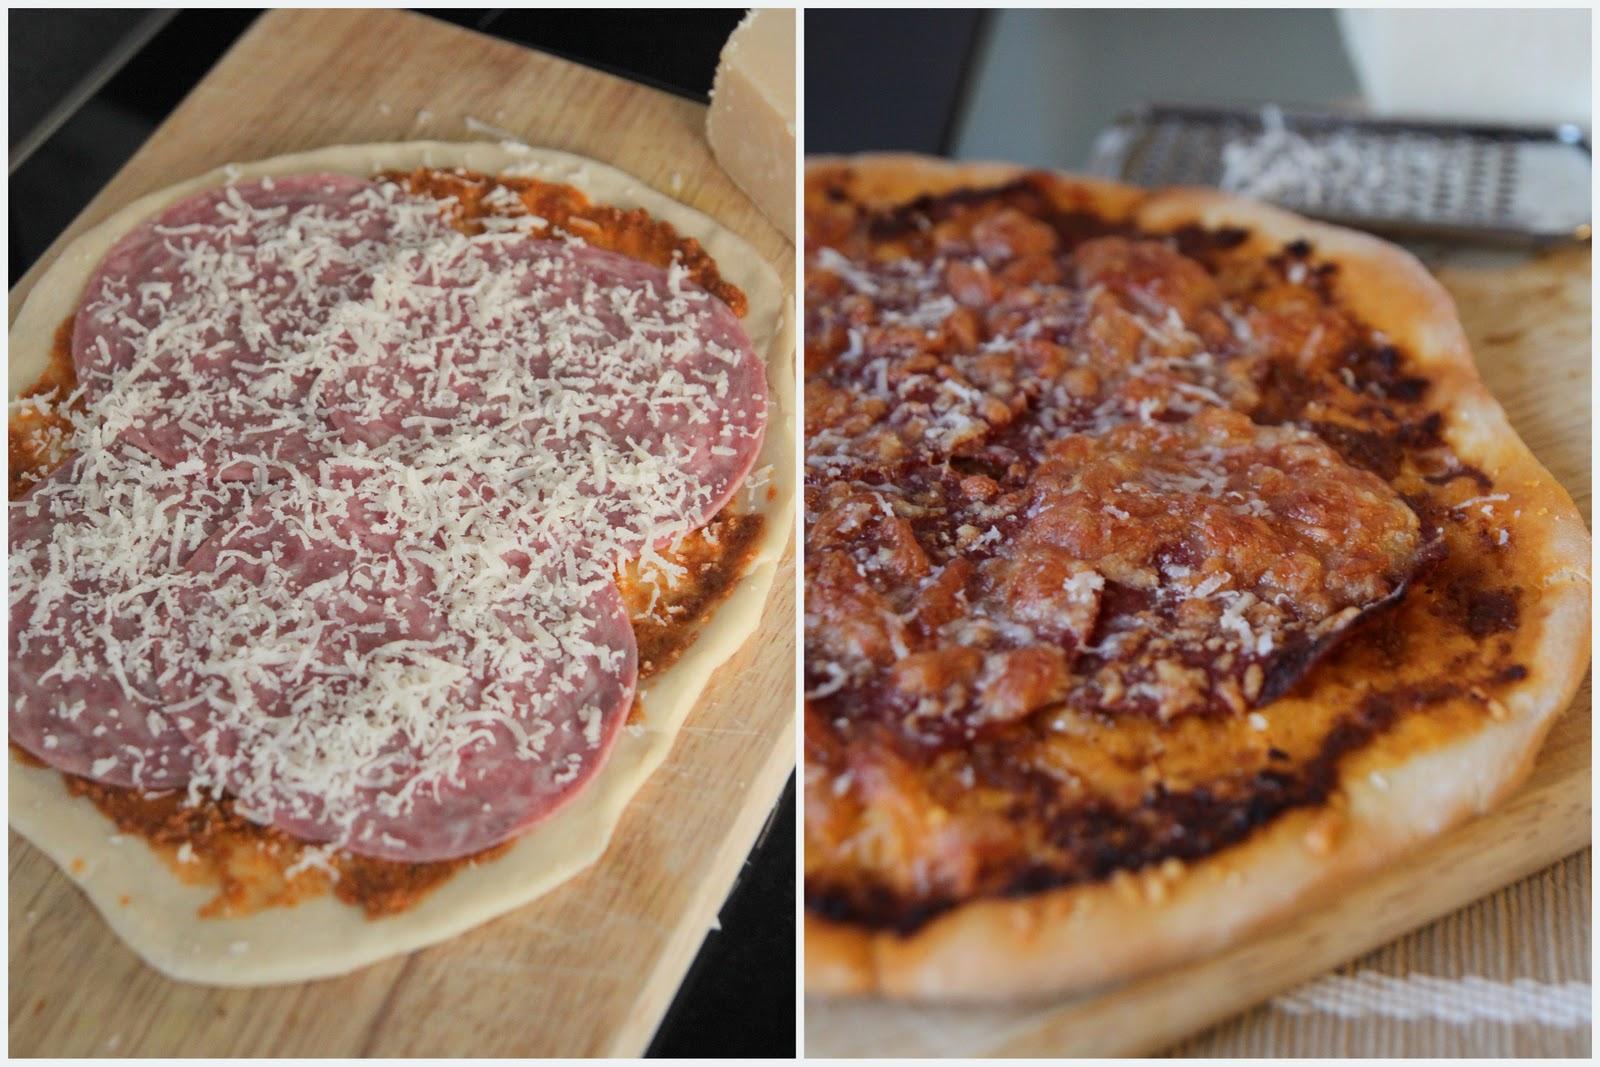 My kitchen antics review domino 39 s pizza versus the sad - Dominos pizza paterna ...